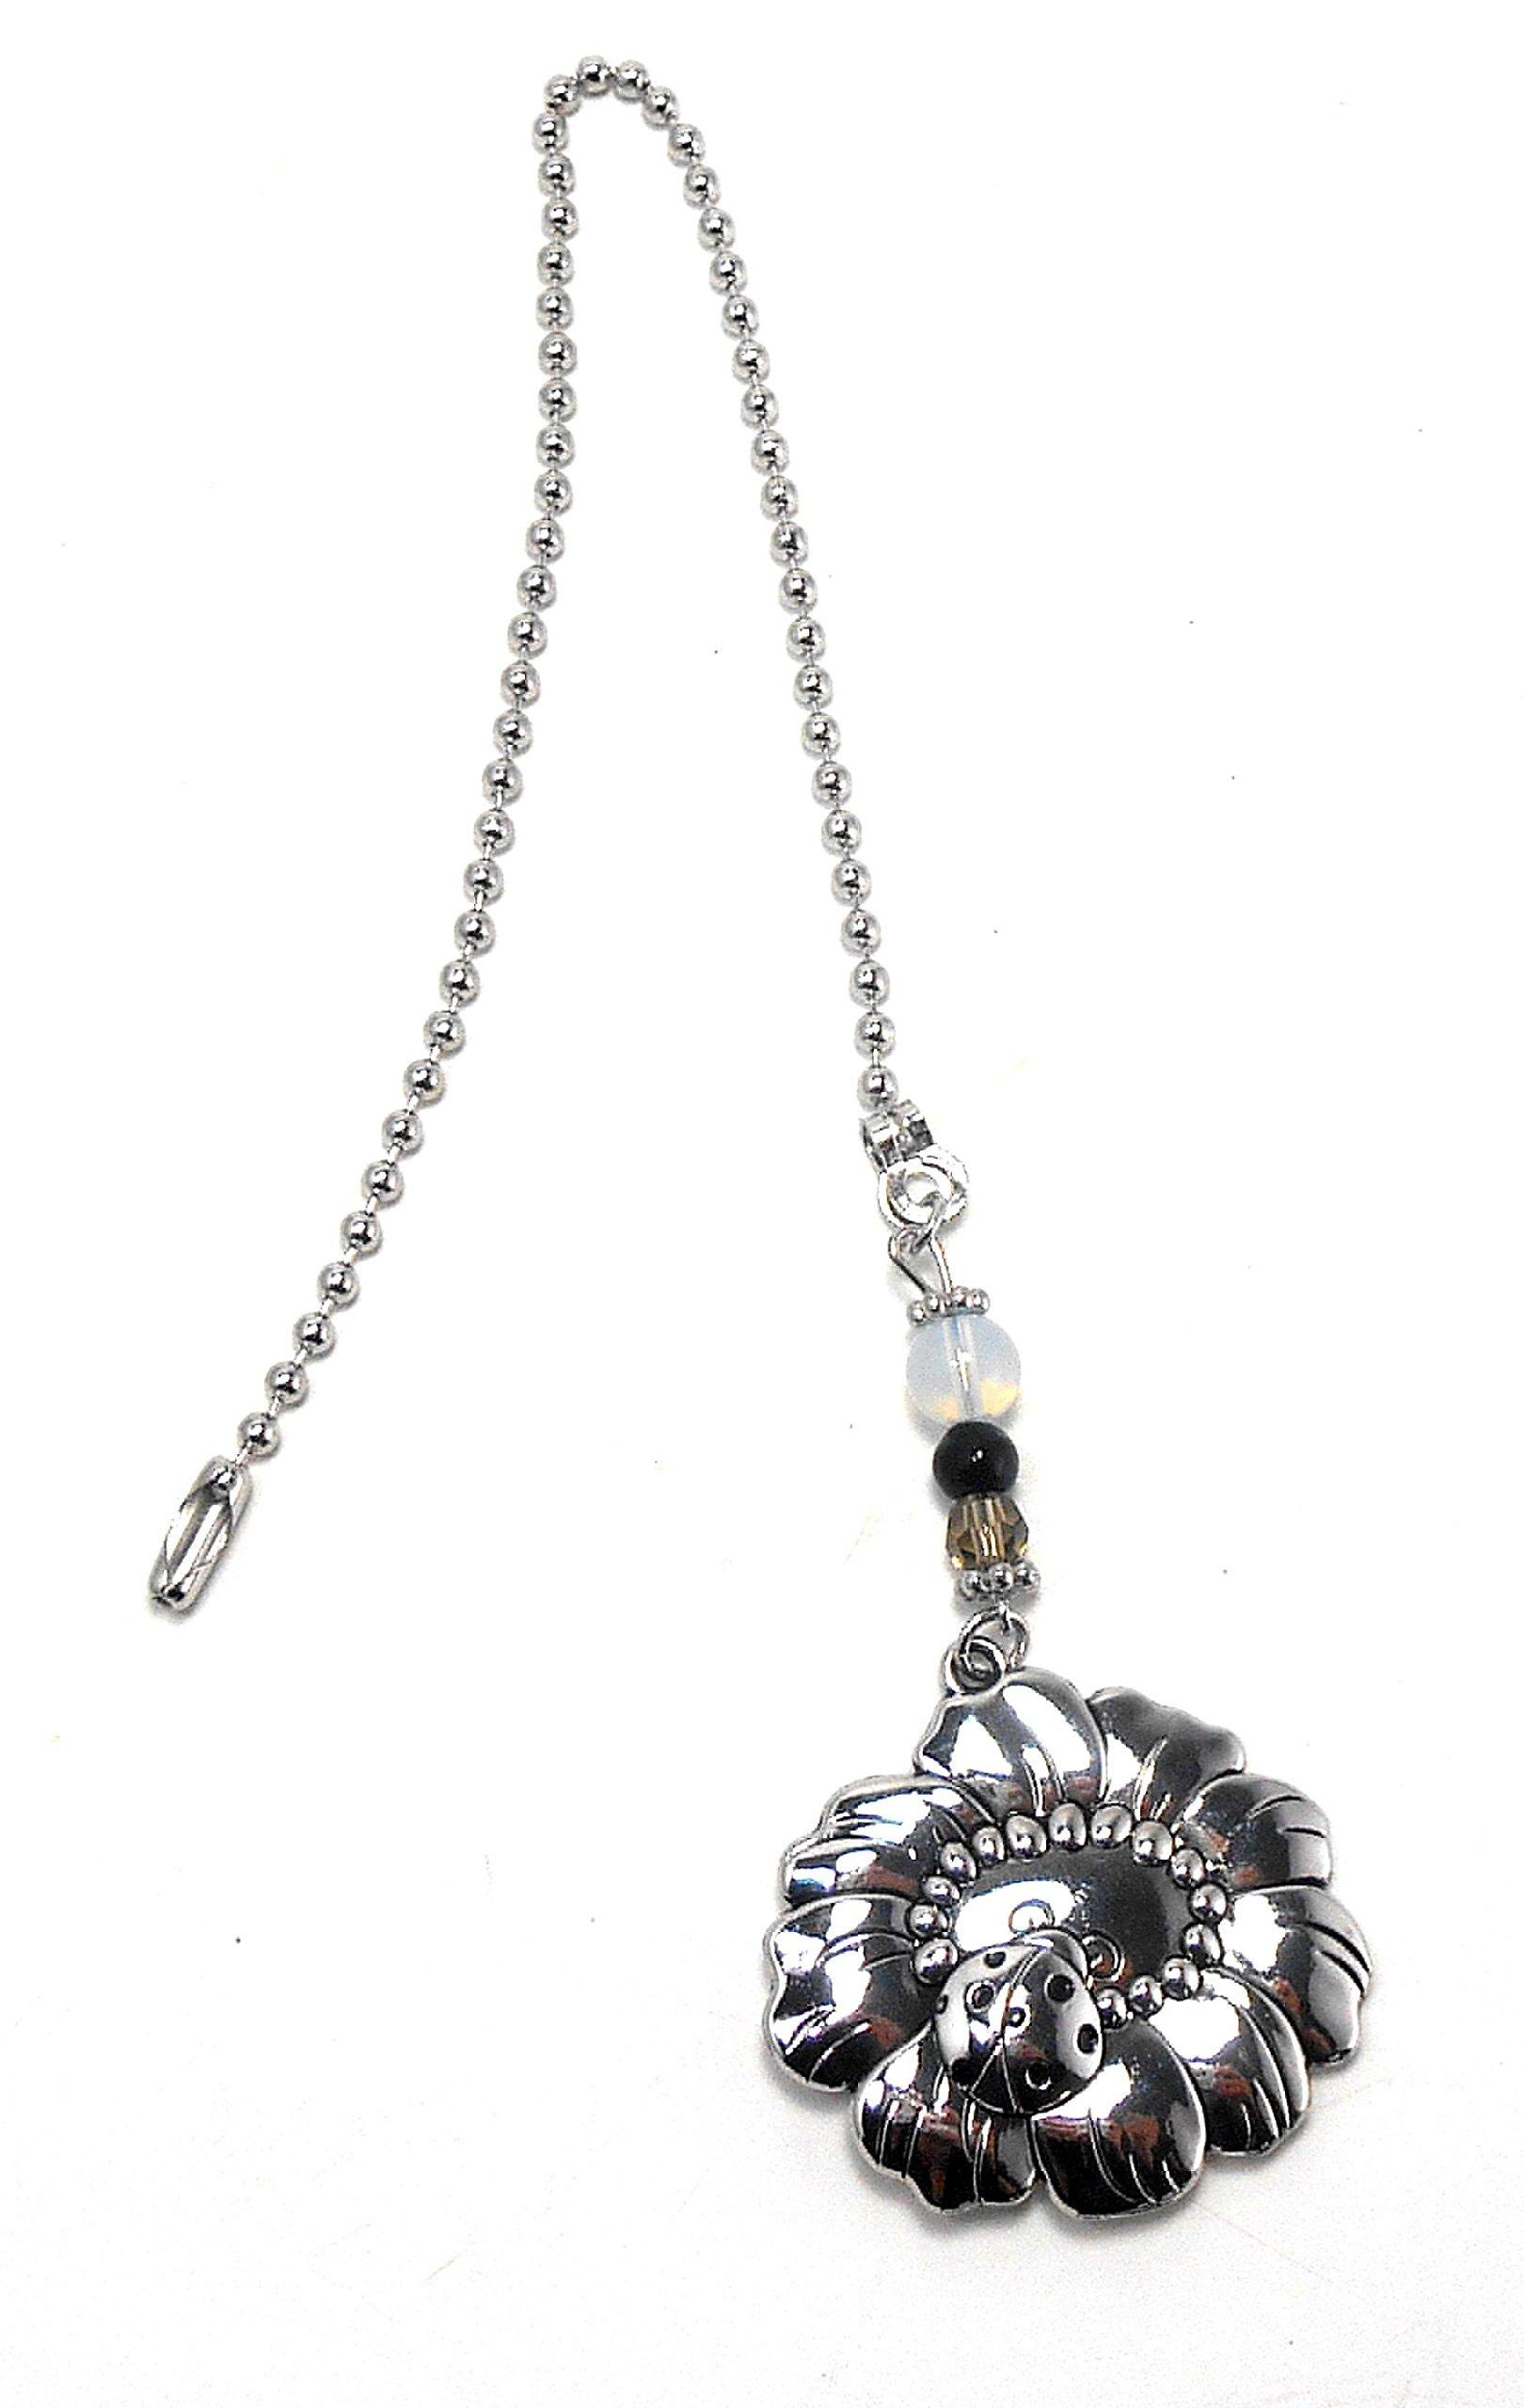 Silver Fan Pull From Ganz - Ladybug & Flower by Ganz (Image #3)